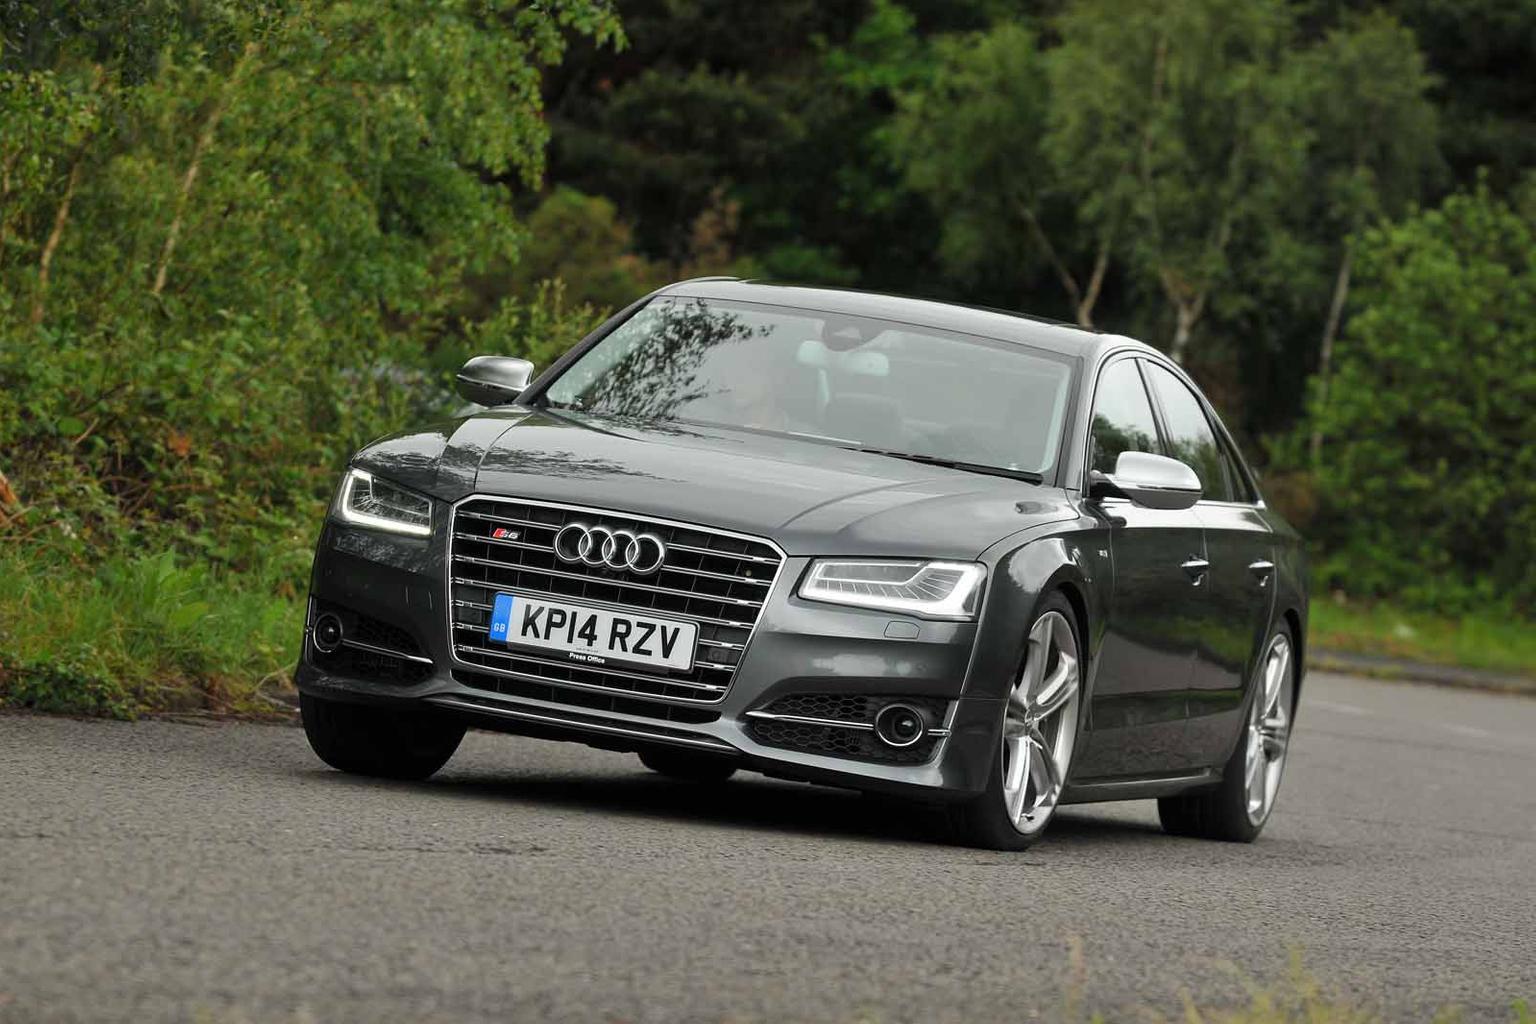 2014 Audi S8 review